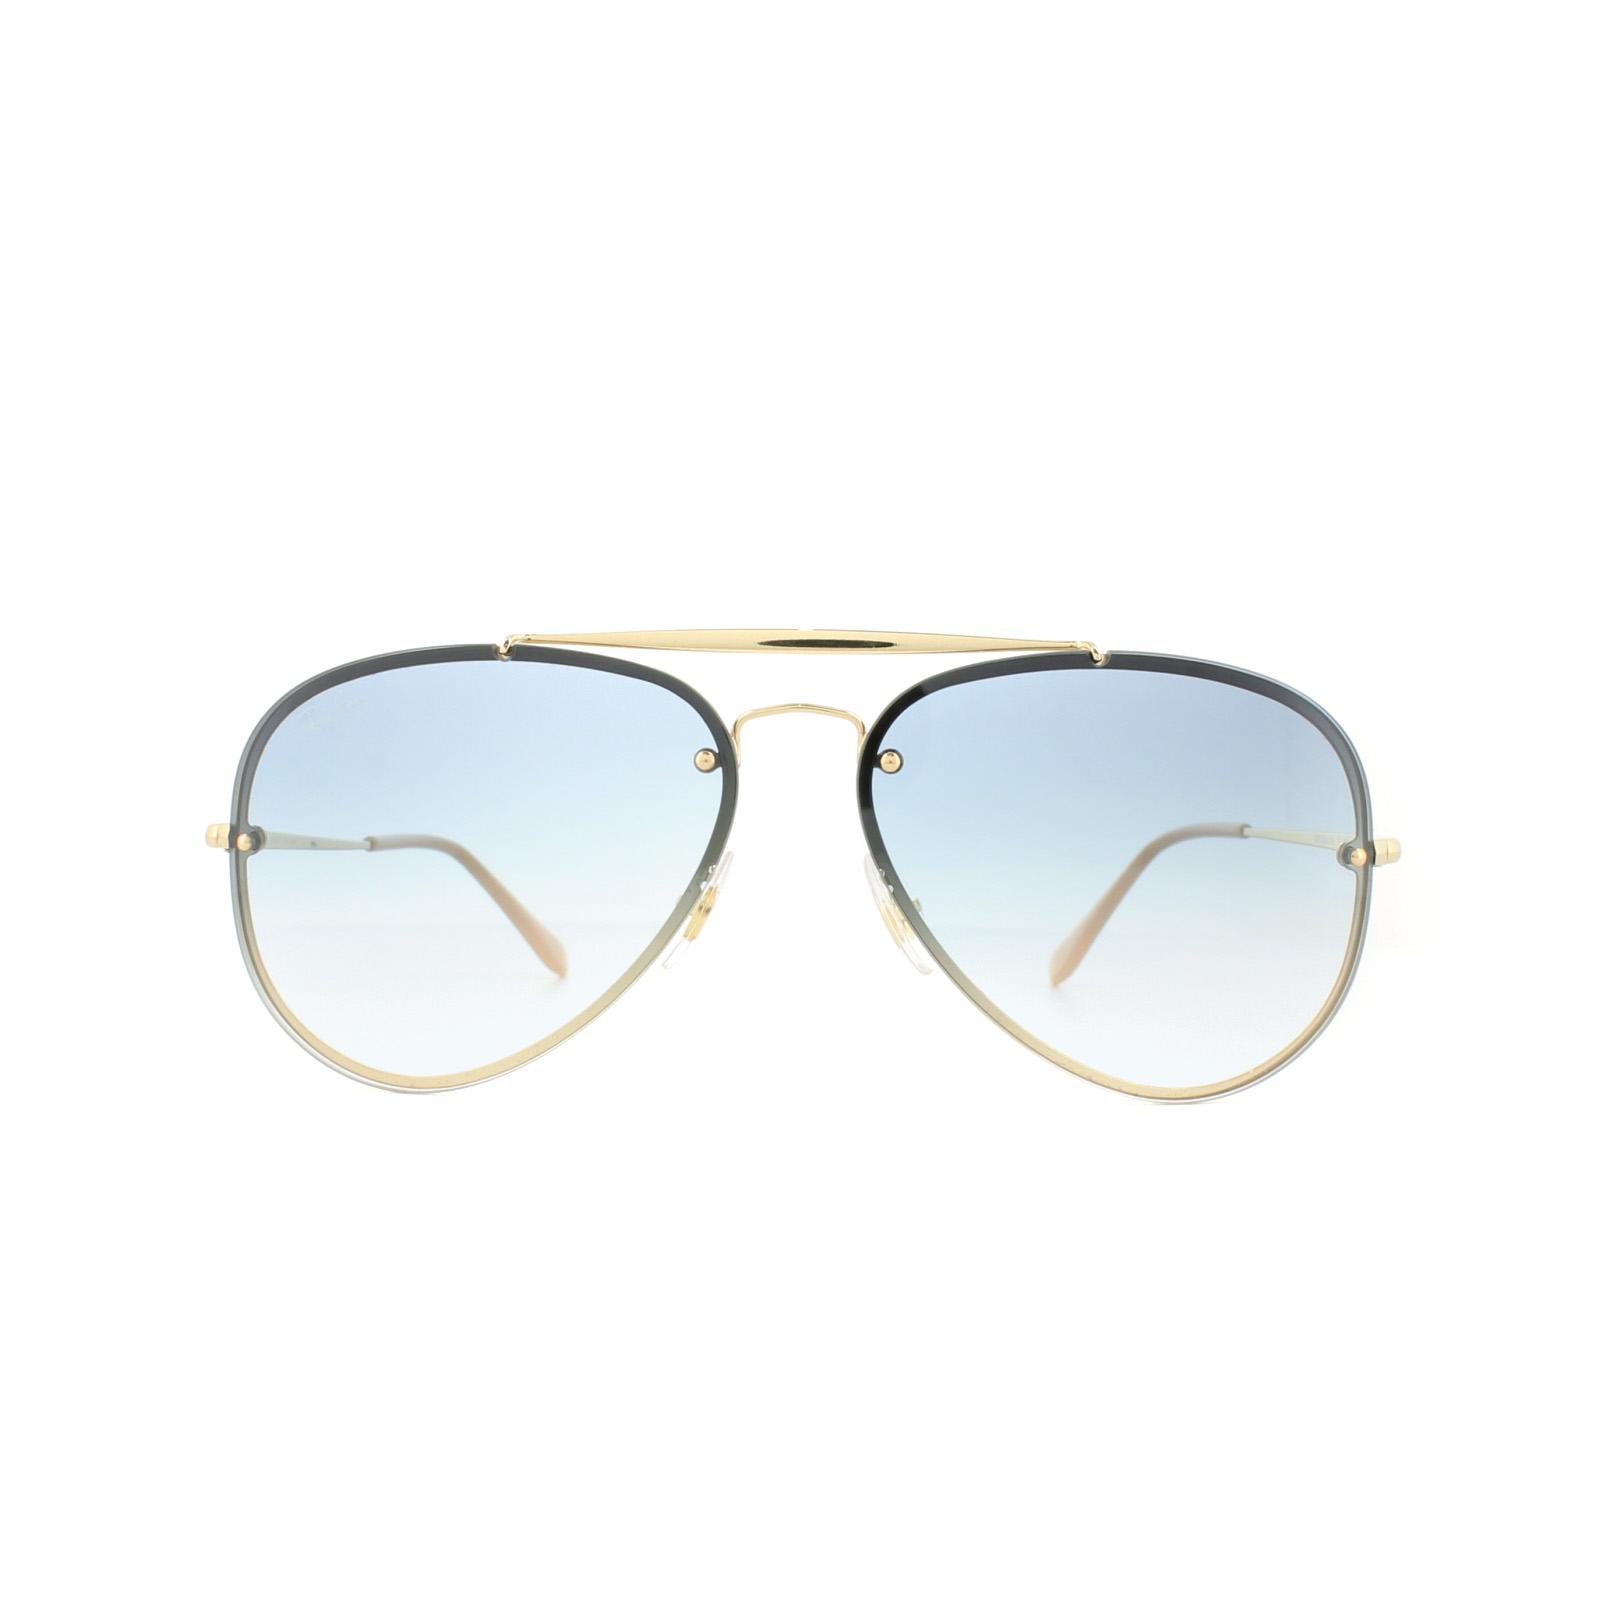 97972a158 Sentinel Ray-Ban Sunglasses Blaze Aviator 3584N 001/19 Gold Light Blue  Gradient